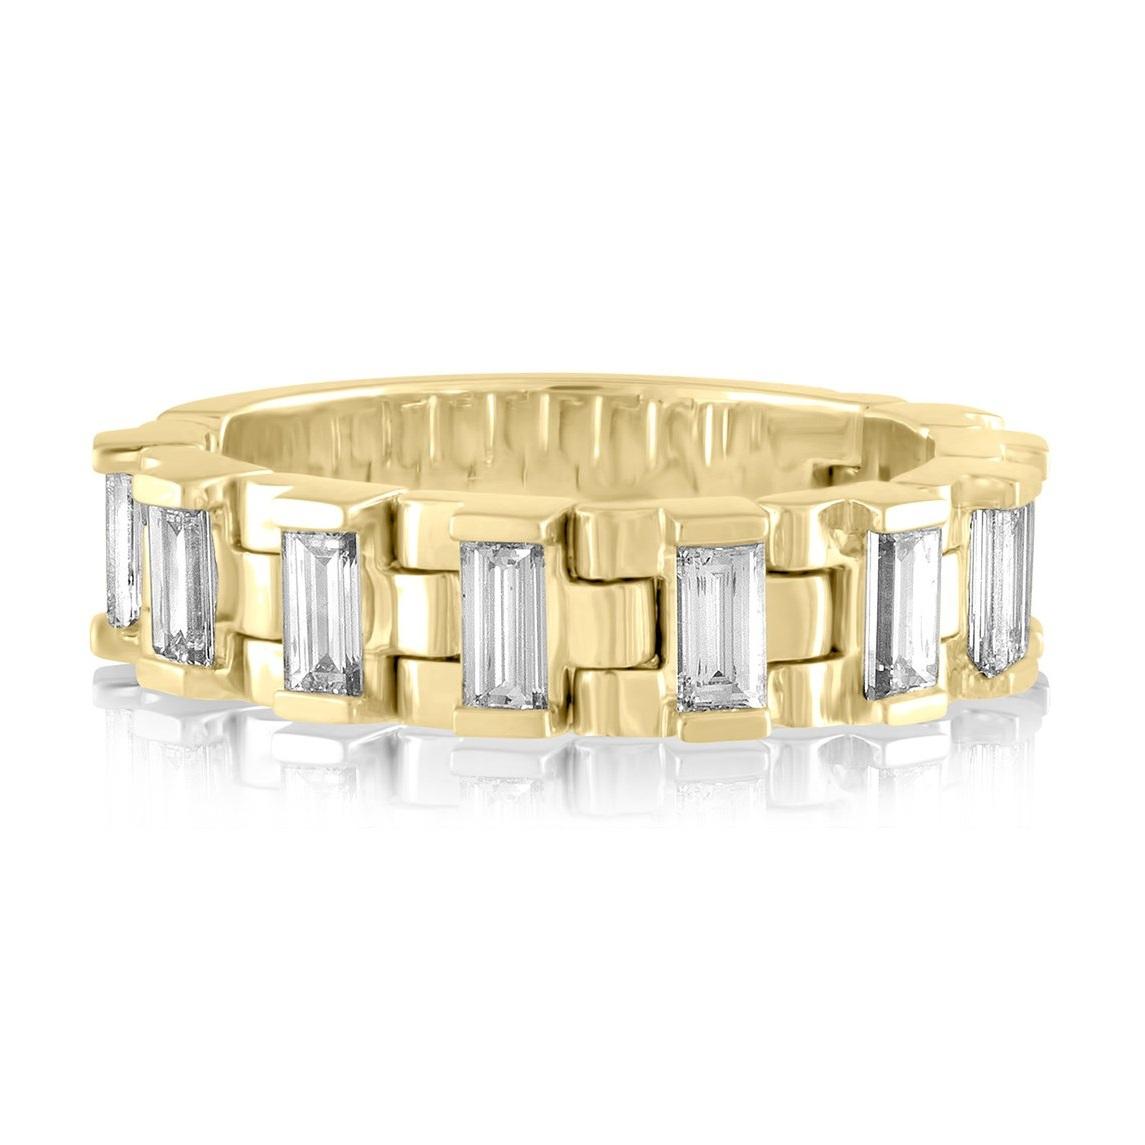 Julie Lamb NY - The Freelance Flexible Diamond Ring